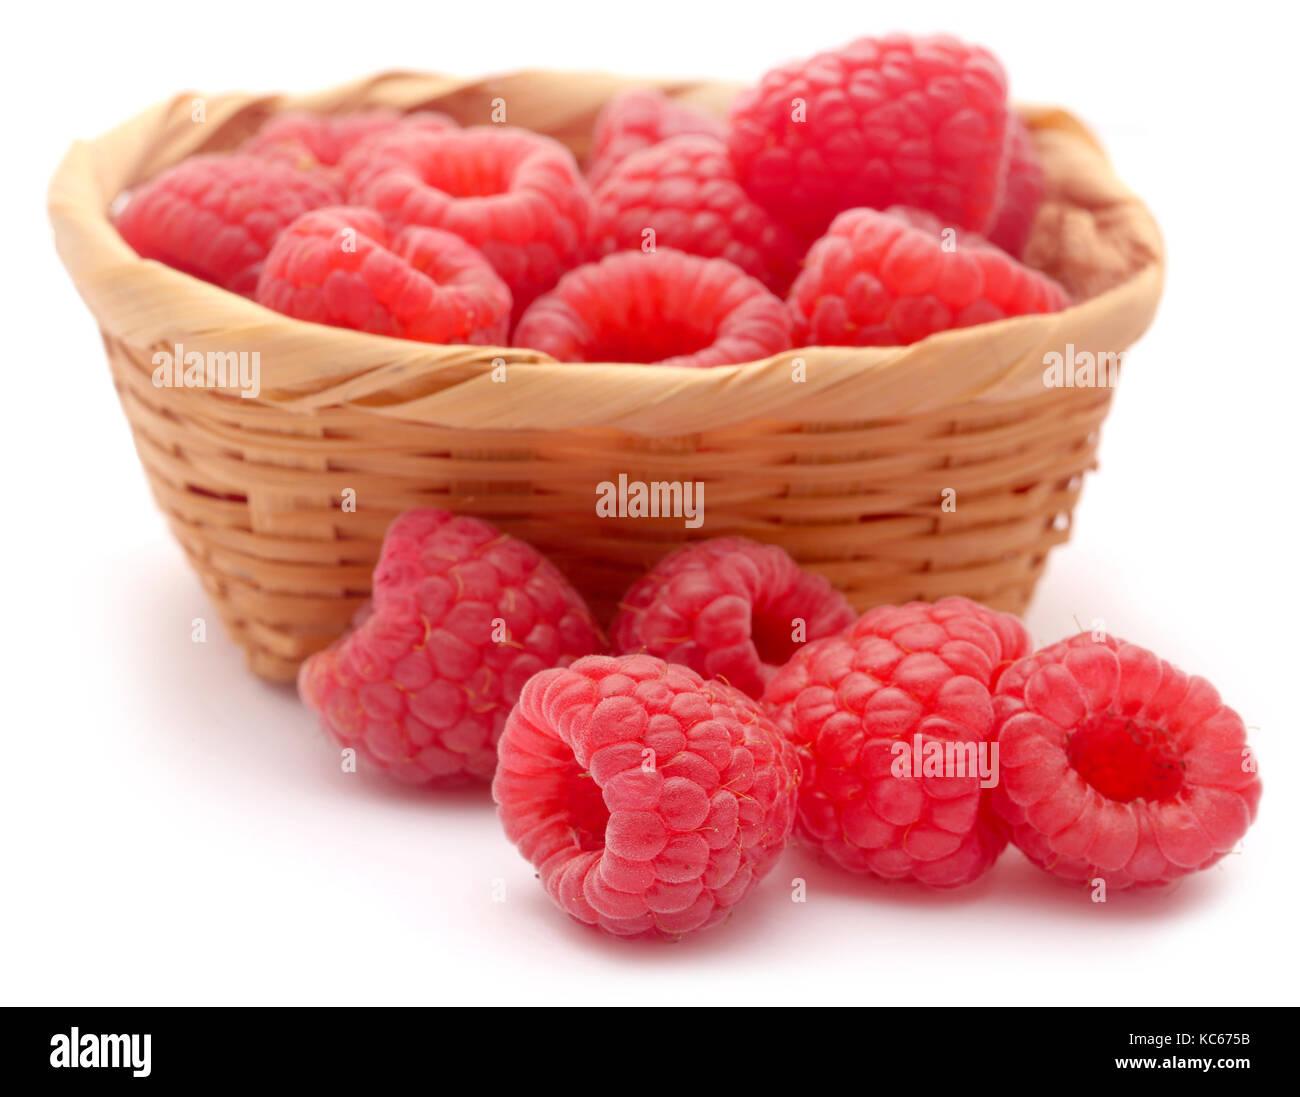 Fresh Raspberry over white background - Stock Image